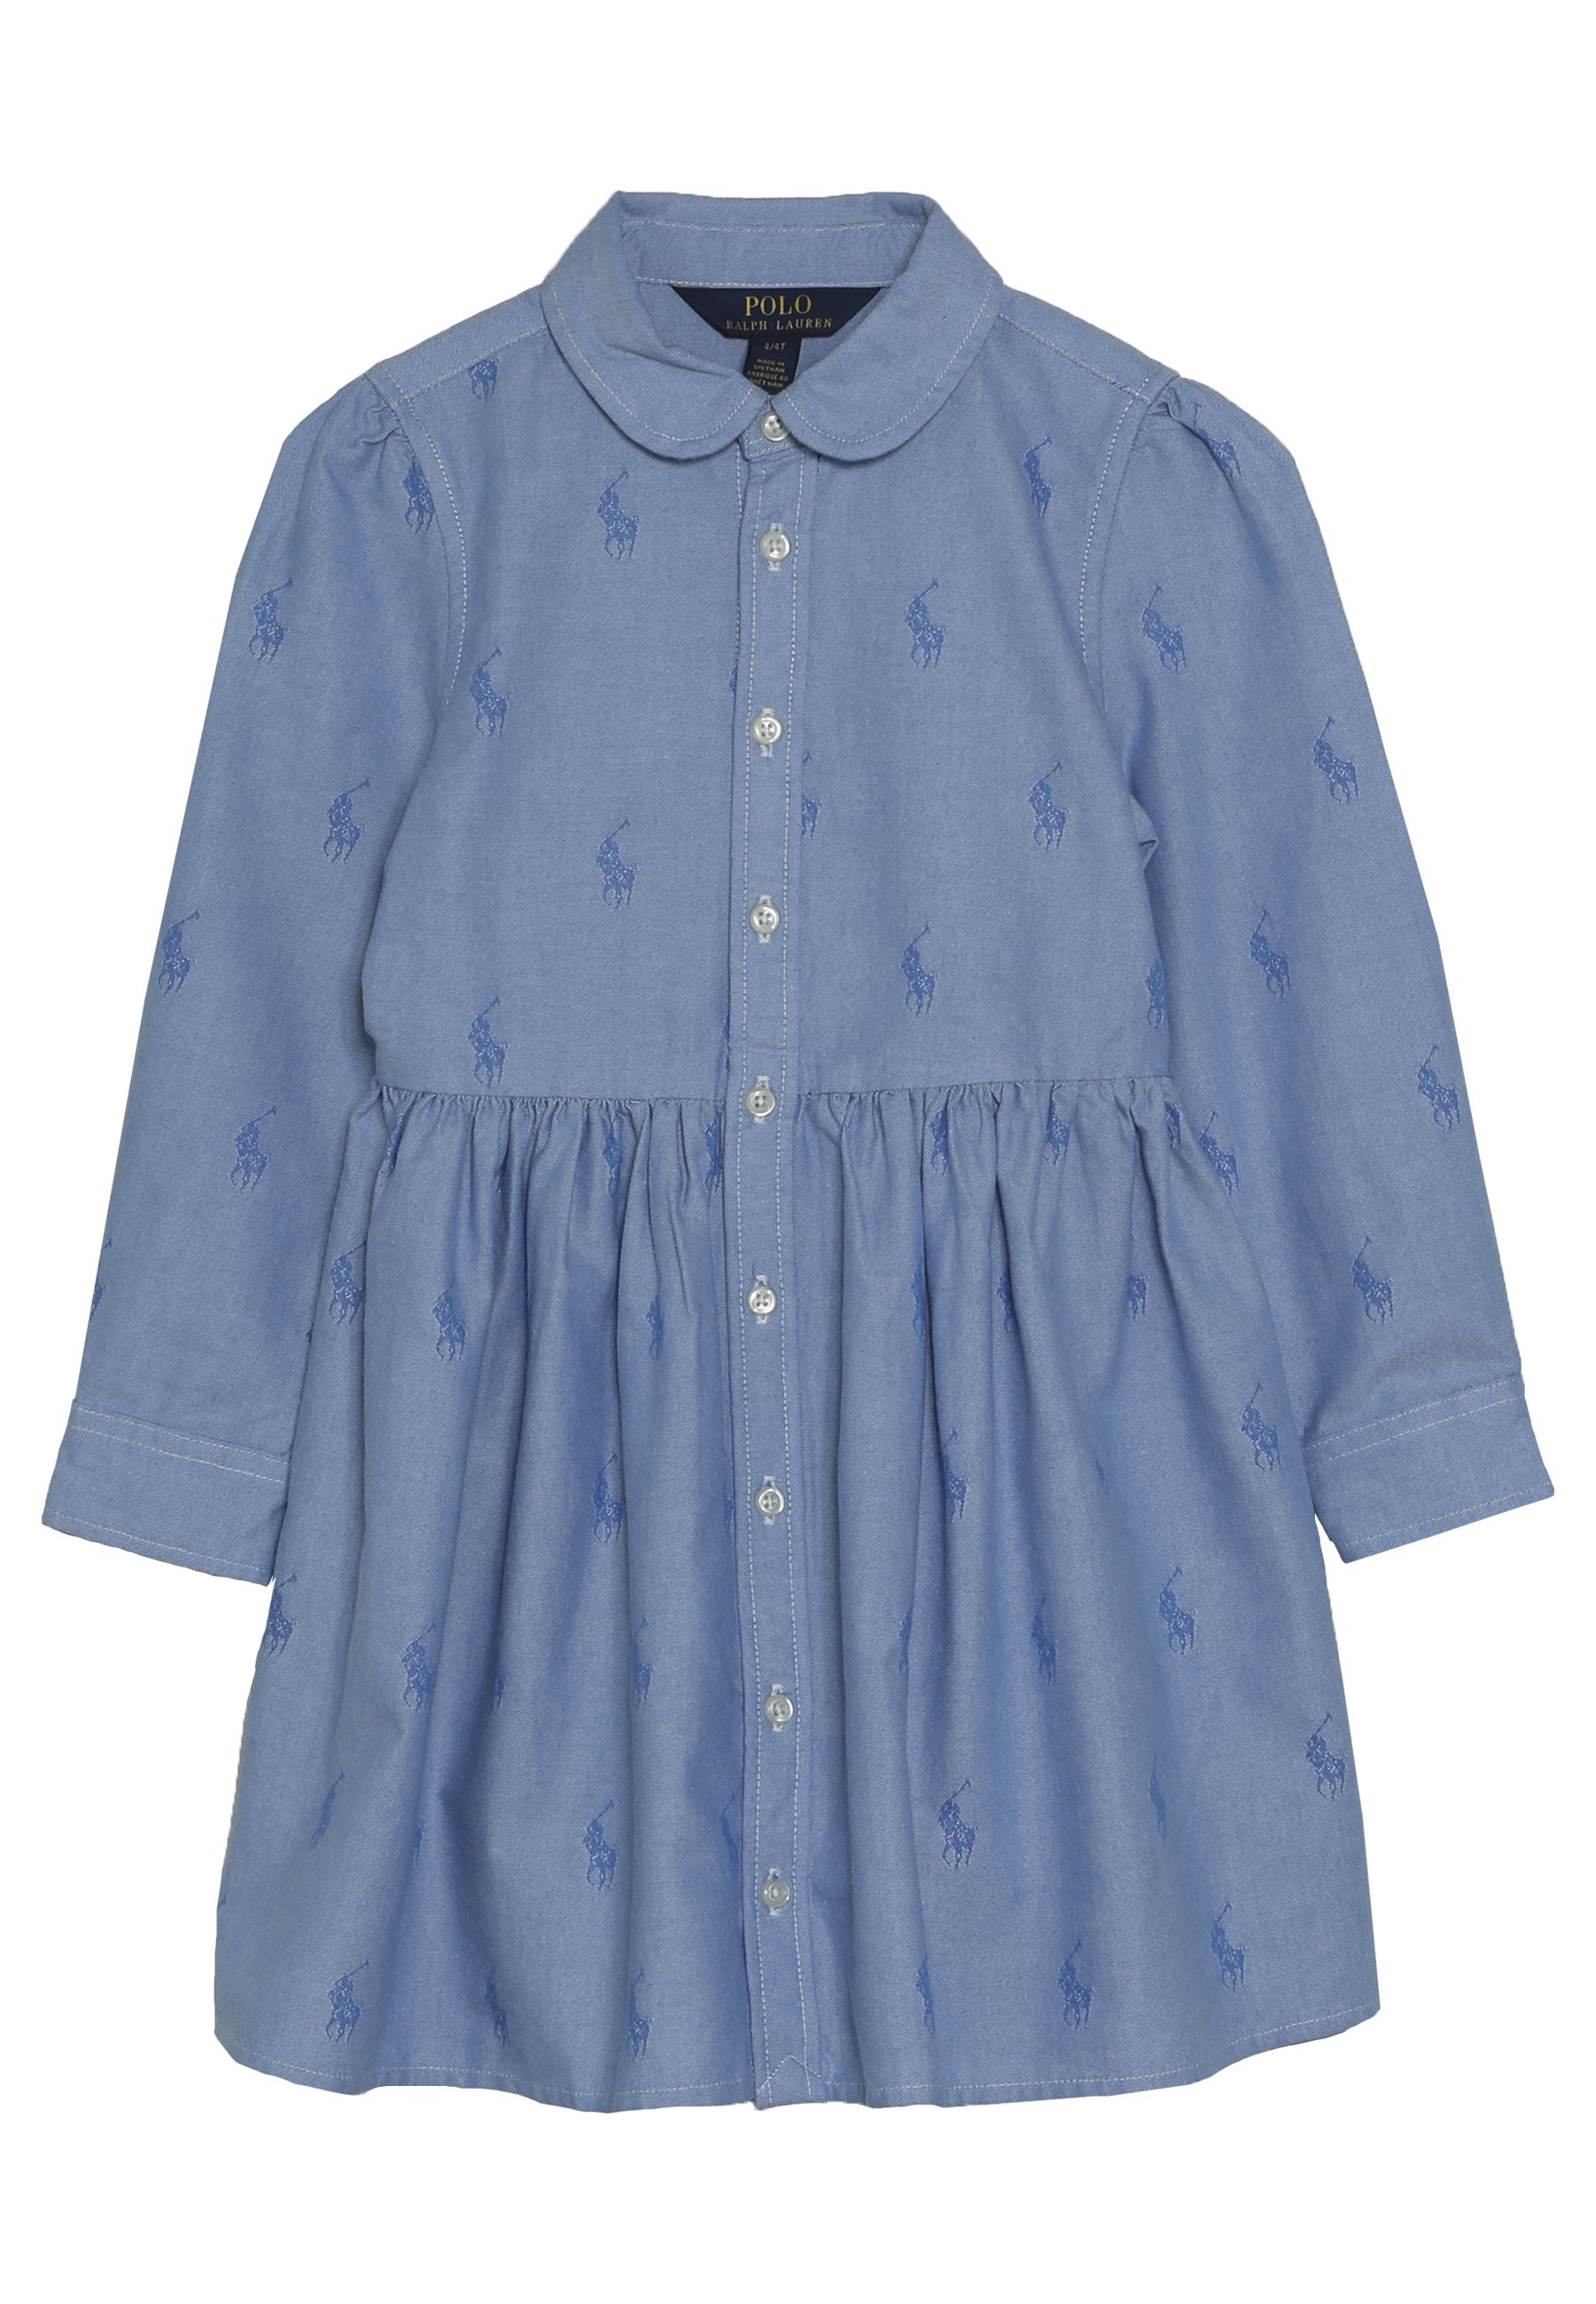 Polo Ralph Lauren DRESS Robe chemise oxford blue